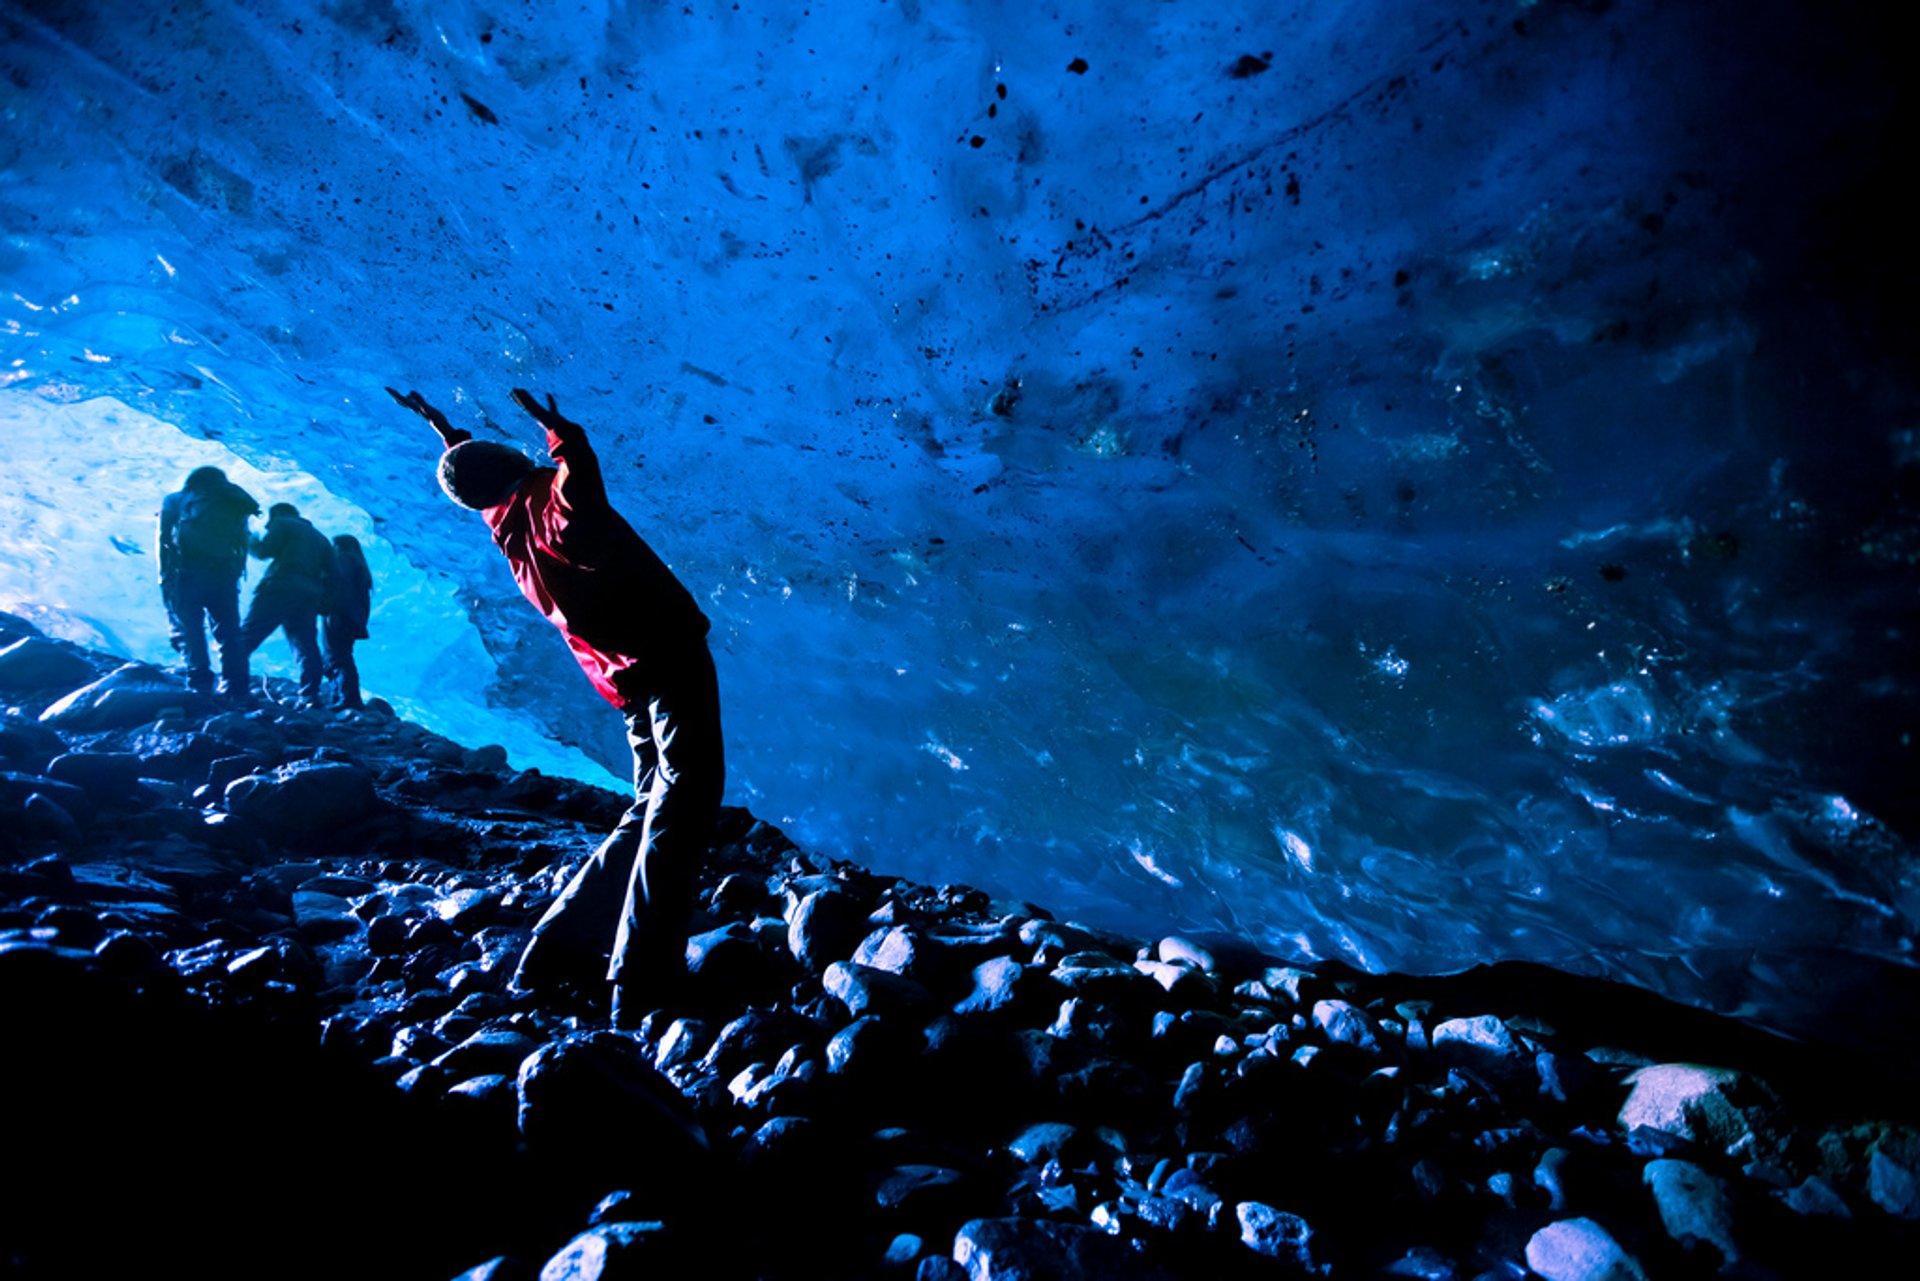 Root glacier ice cave  2020